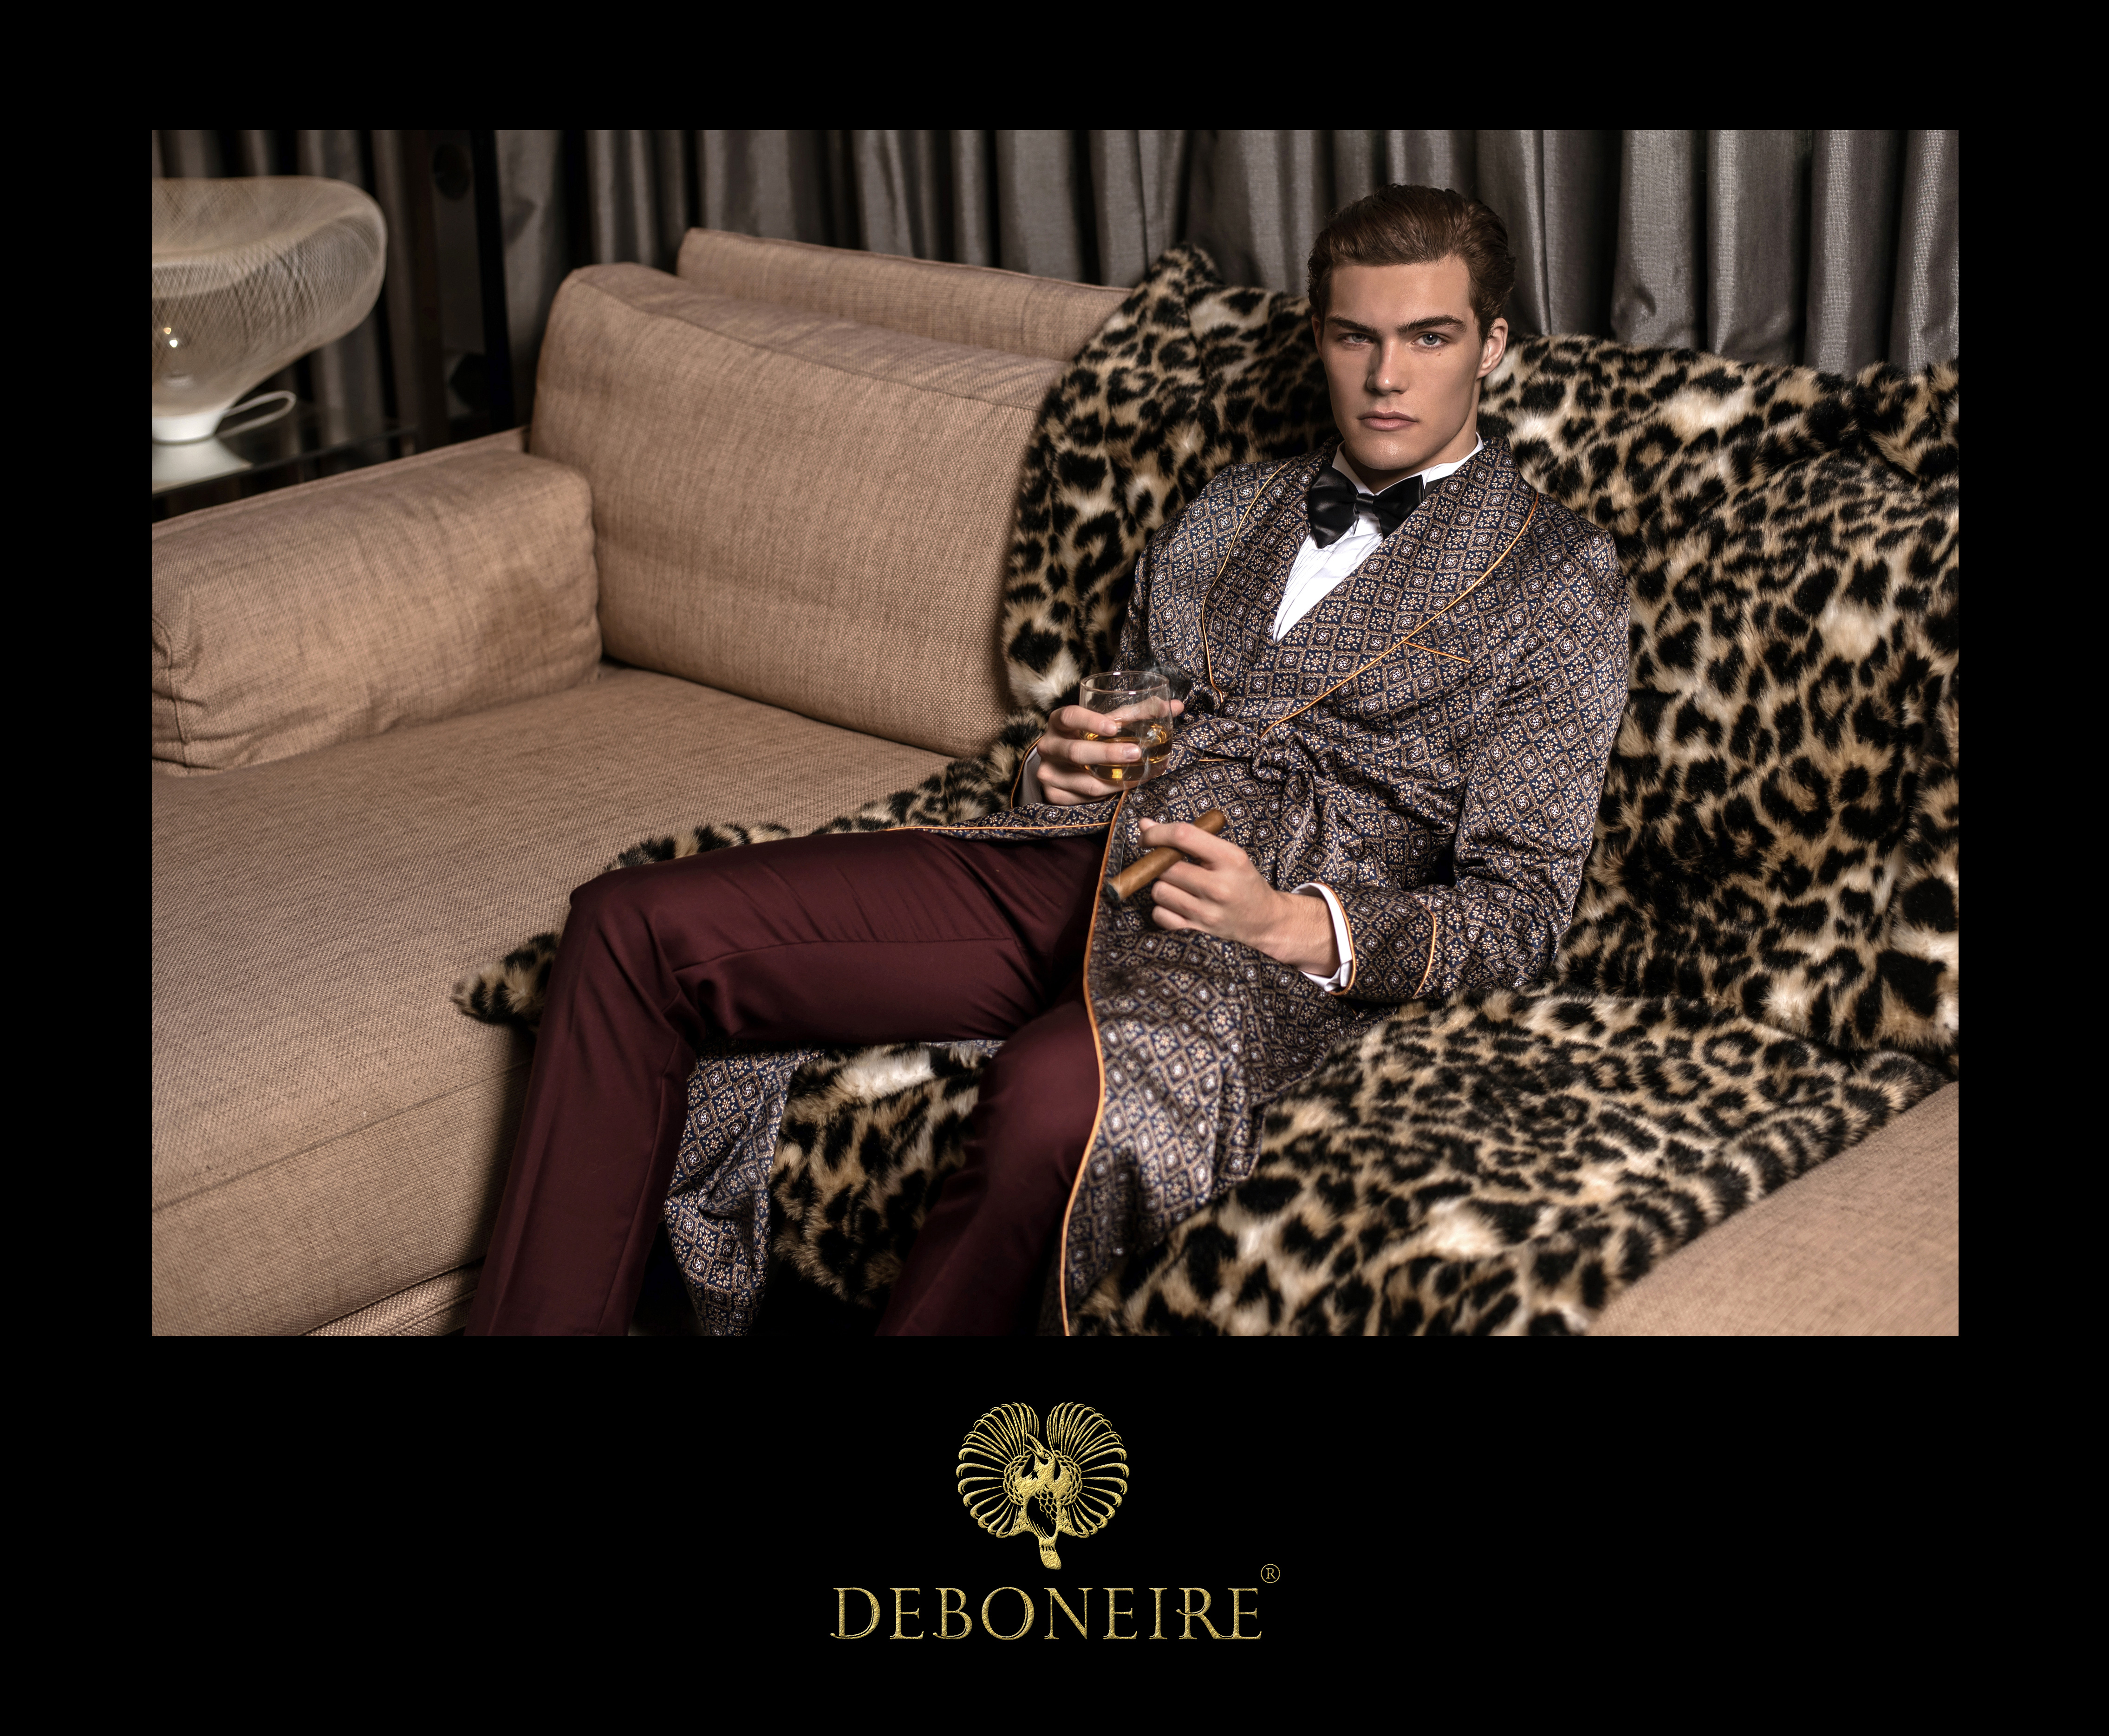 DEBONEIRE men's fashion bespoke tailoring with exquisite fabric.